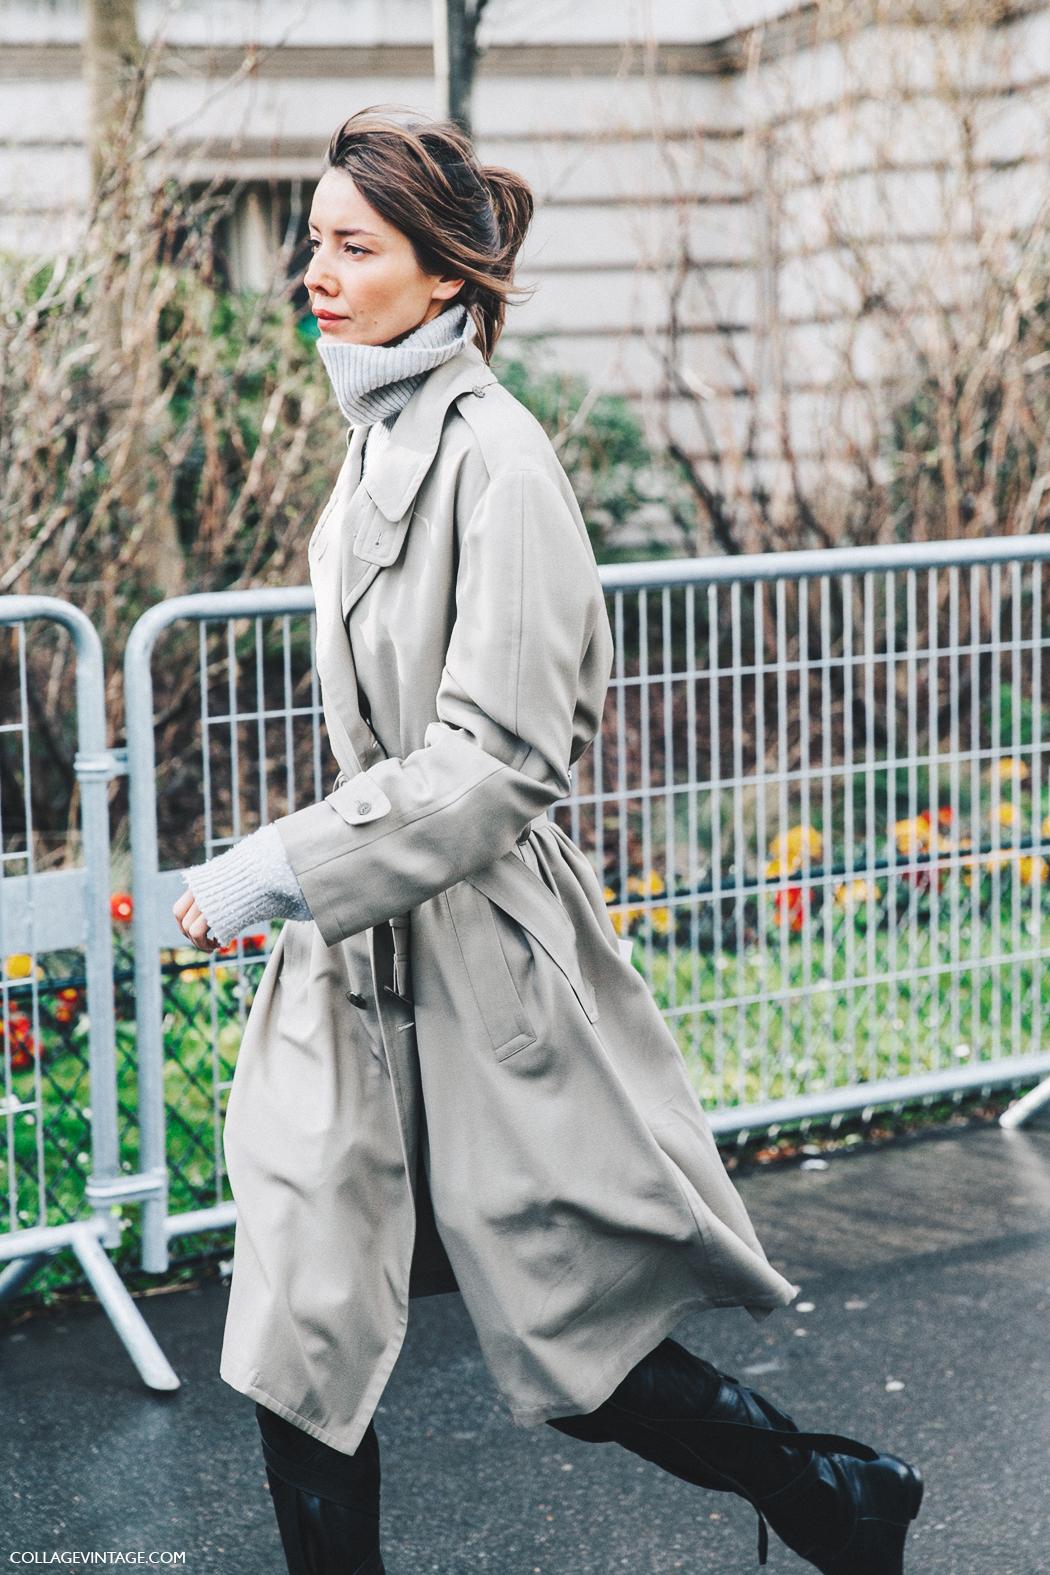 PFW-Paris_Fashion_Week_Fall_2016-Street_Style-Collage_Vintage-Trench_Coat-Chloe_1